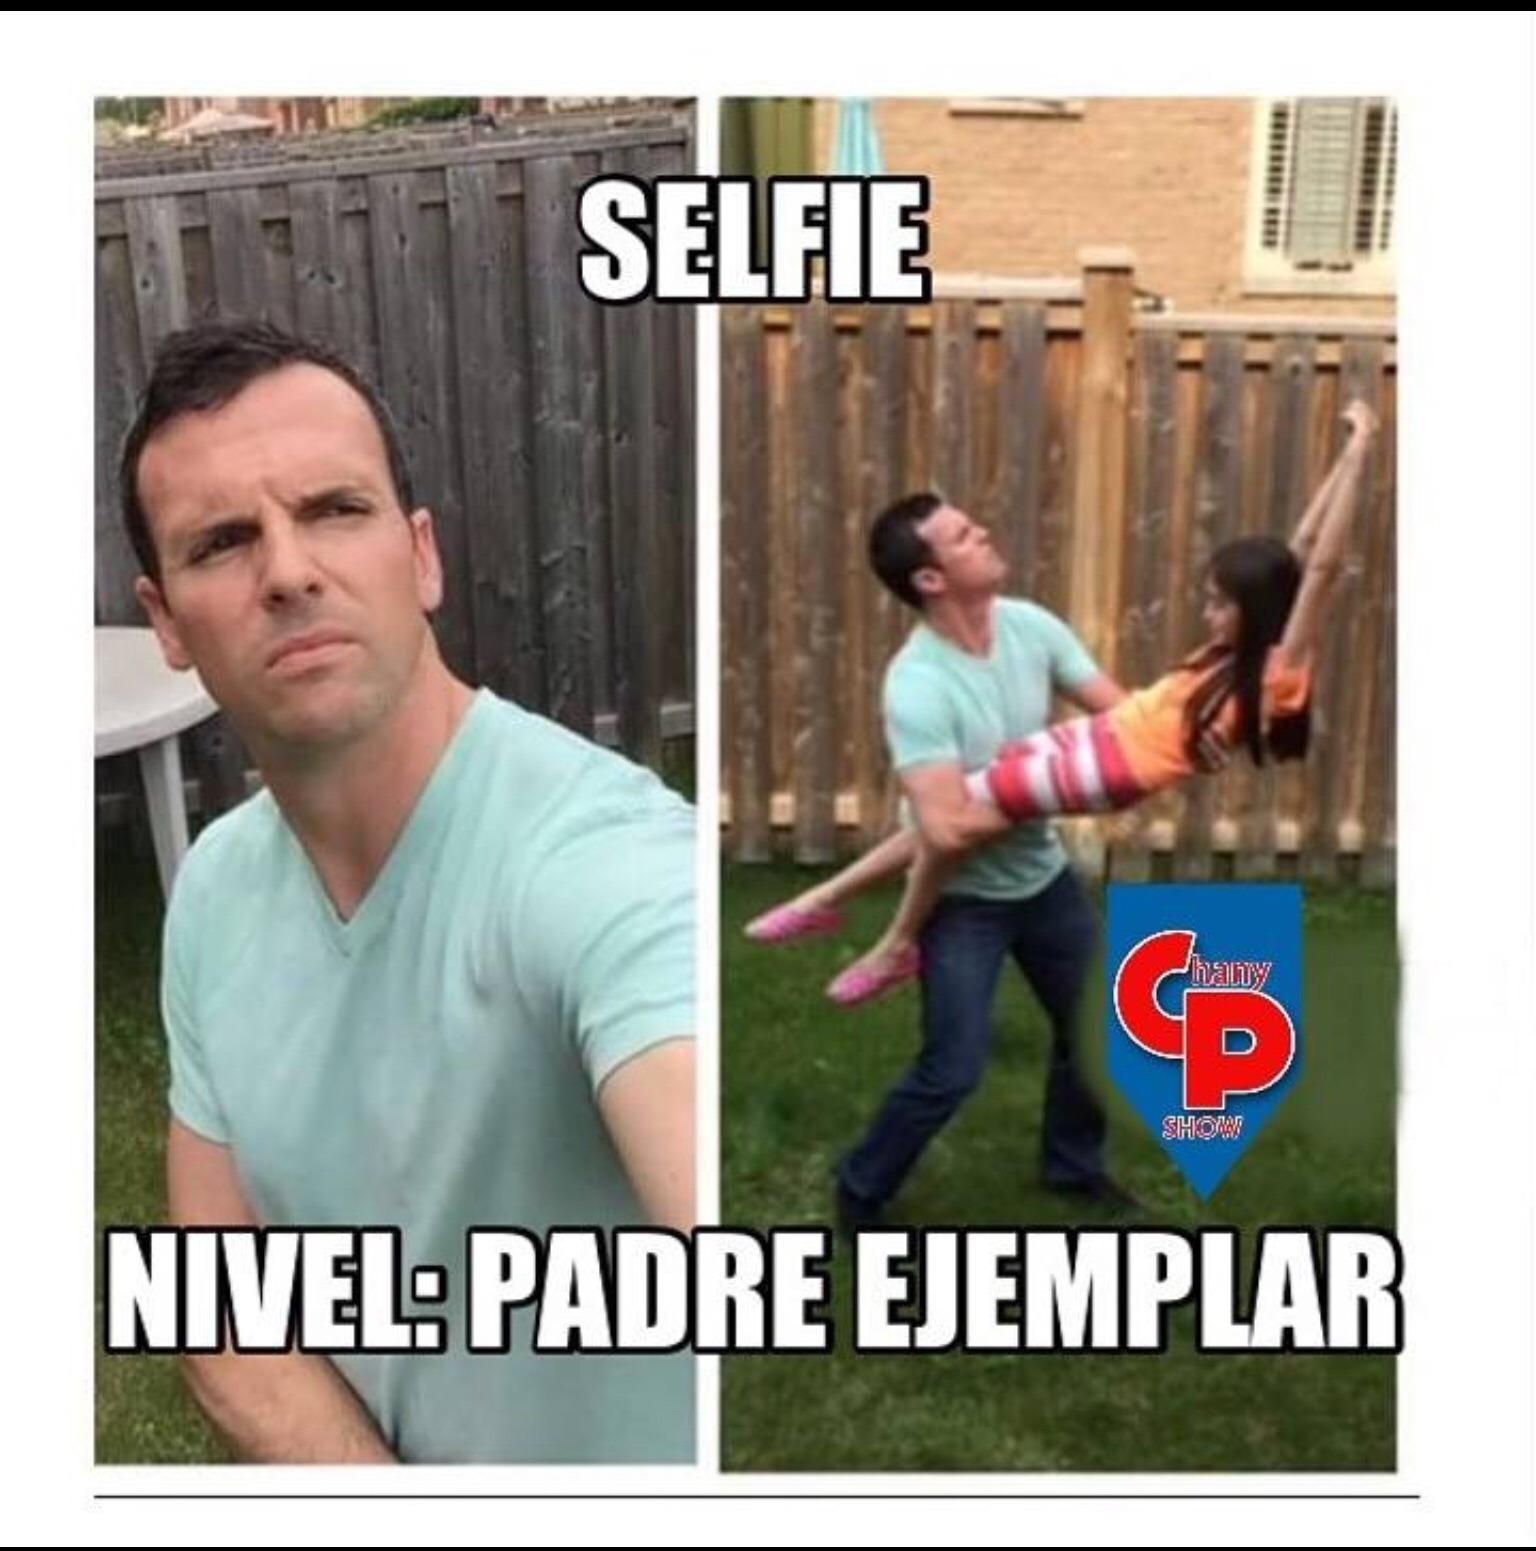 Selfie - Meme by pokeXD :) Memedroid